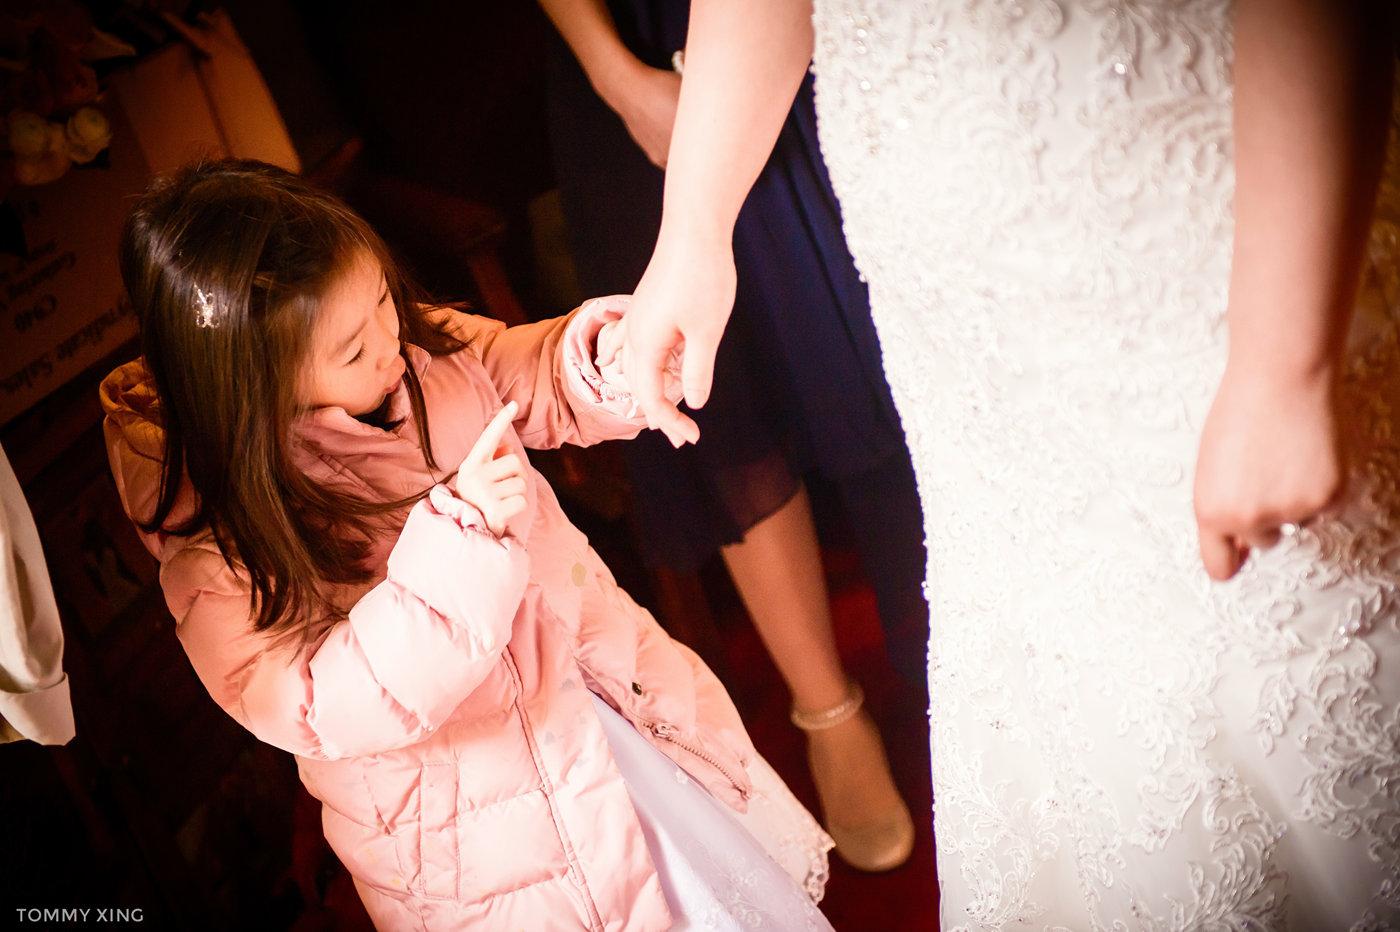 STANFORD MEMORIAL CHURCH WEDDING - Wenjie & Chengcheng - SAN FRANCISCO BAY AREA 斯坦福教堂婚礼跟拍 - 洛杉矶婚礼婚纱照摄影师 Tommy Xing Photography052.jpg